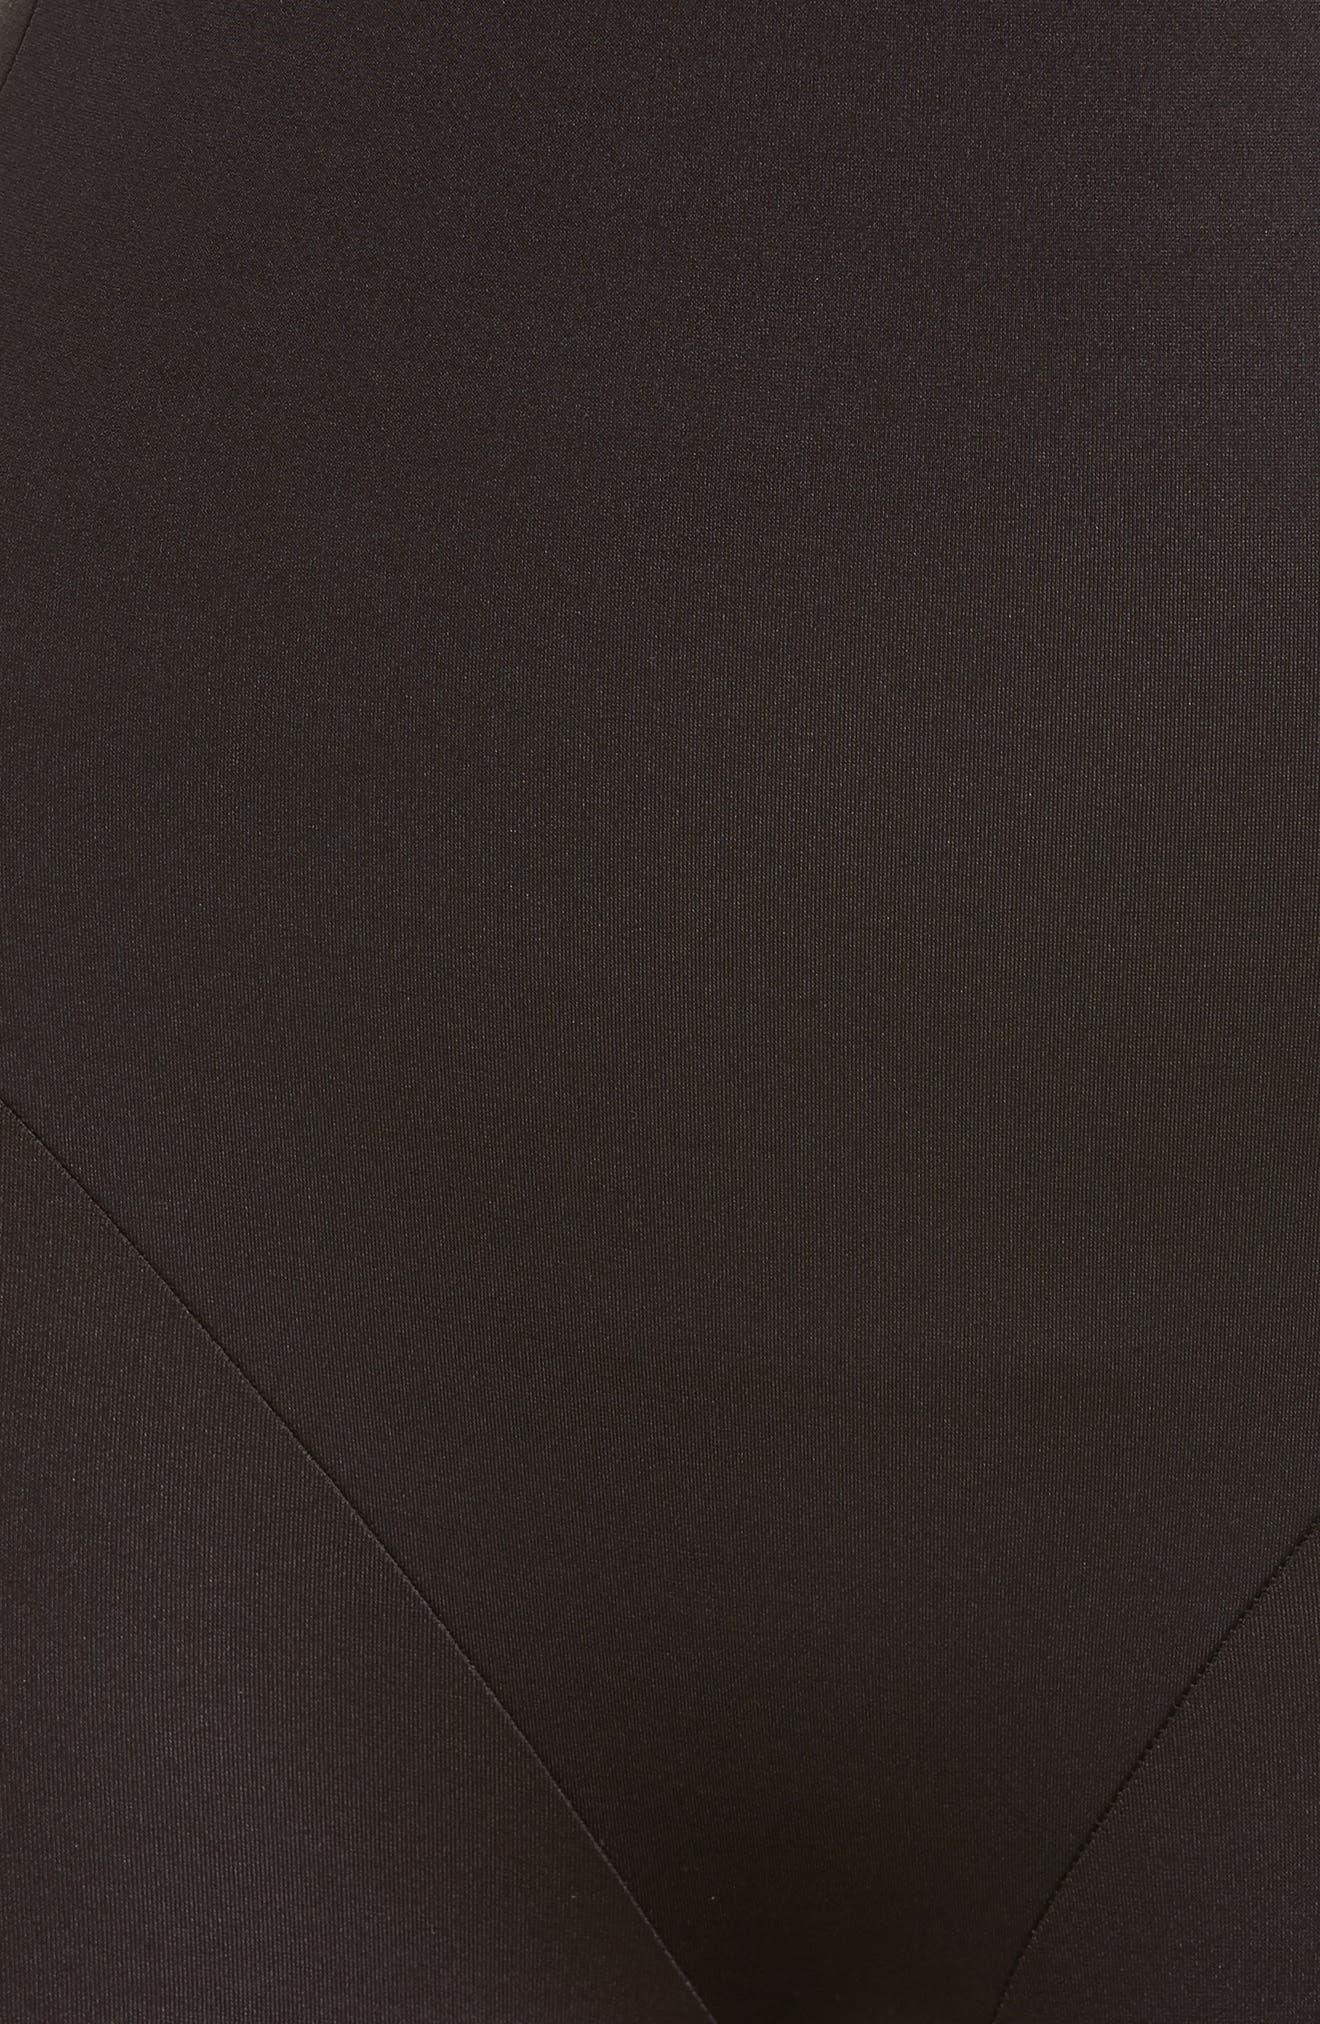 Boost & Reduce High Waist Shaping Boyshorts,                             Alternate thumbnail 5, color,                             BLACK